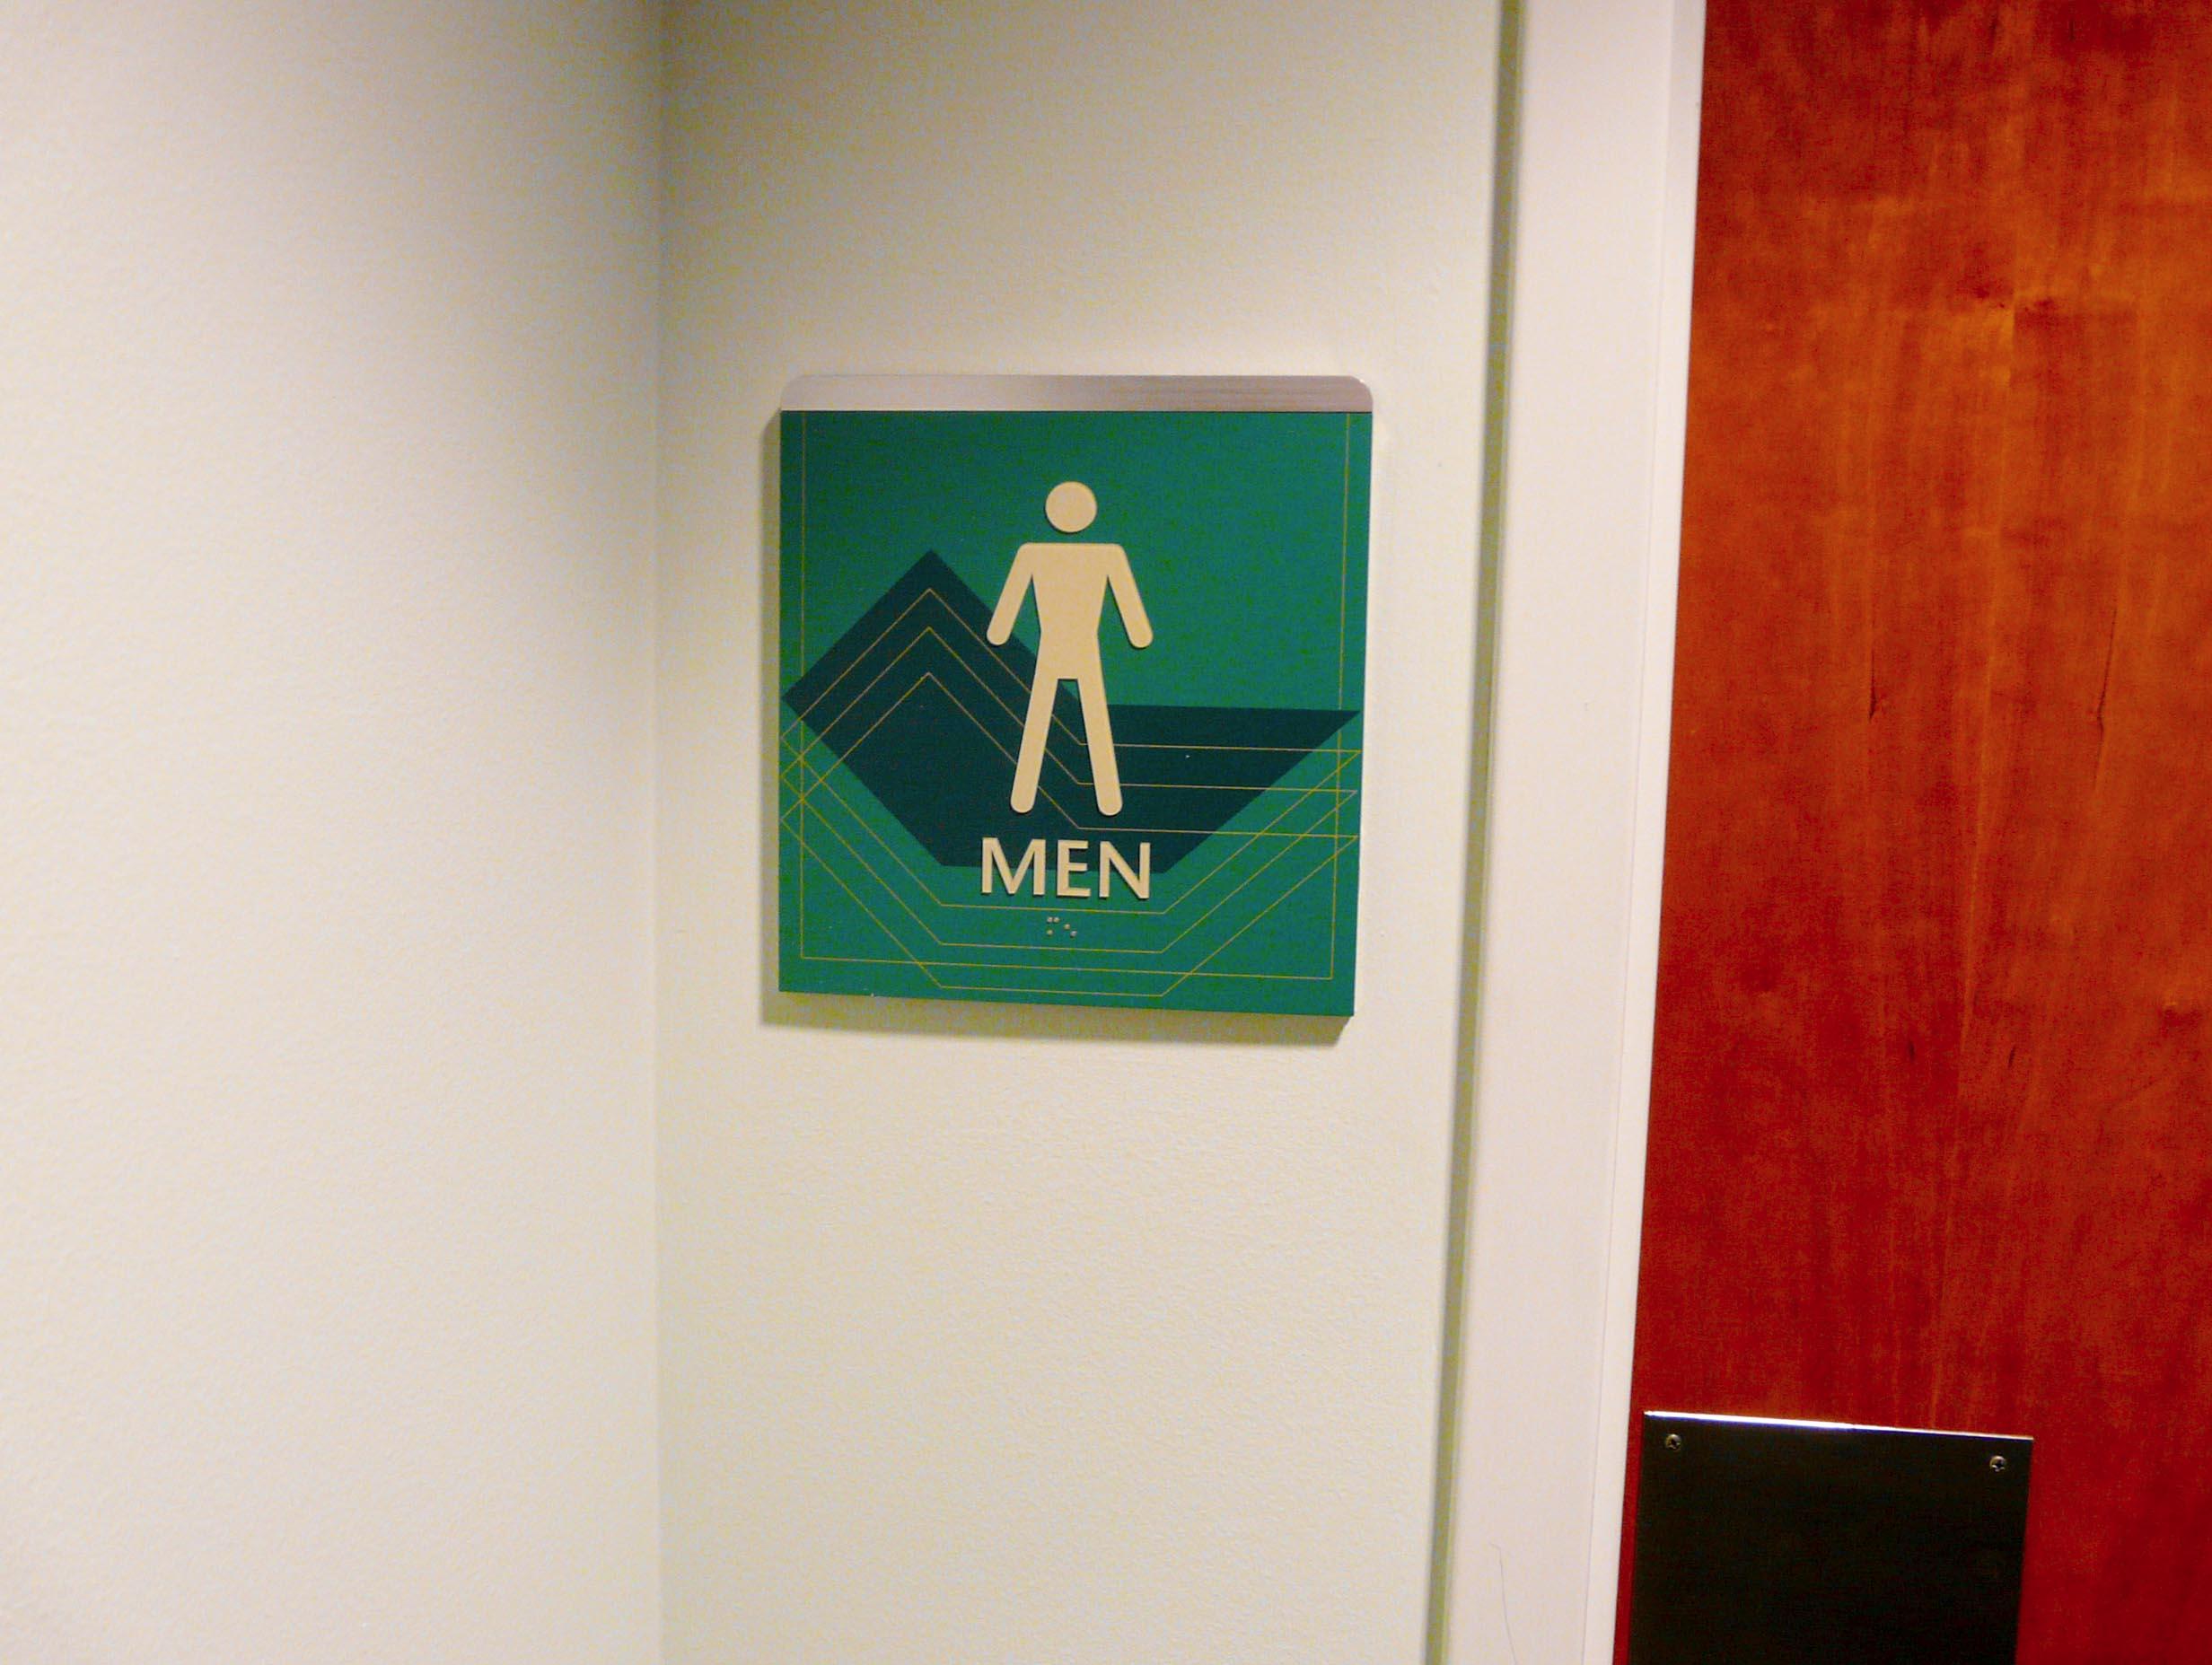 university bathroom sign wayfinding.jpg